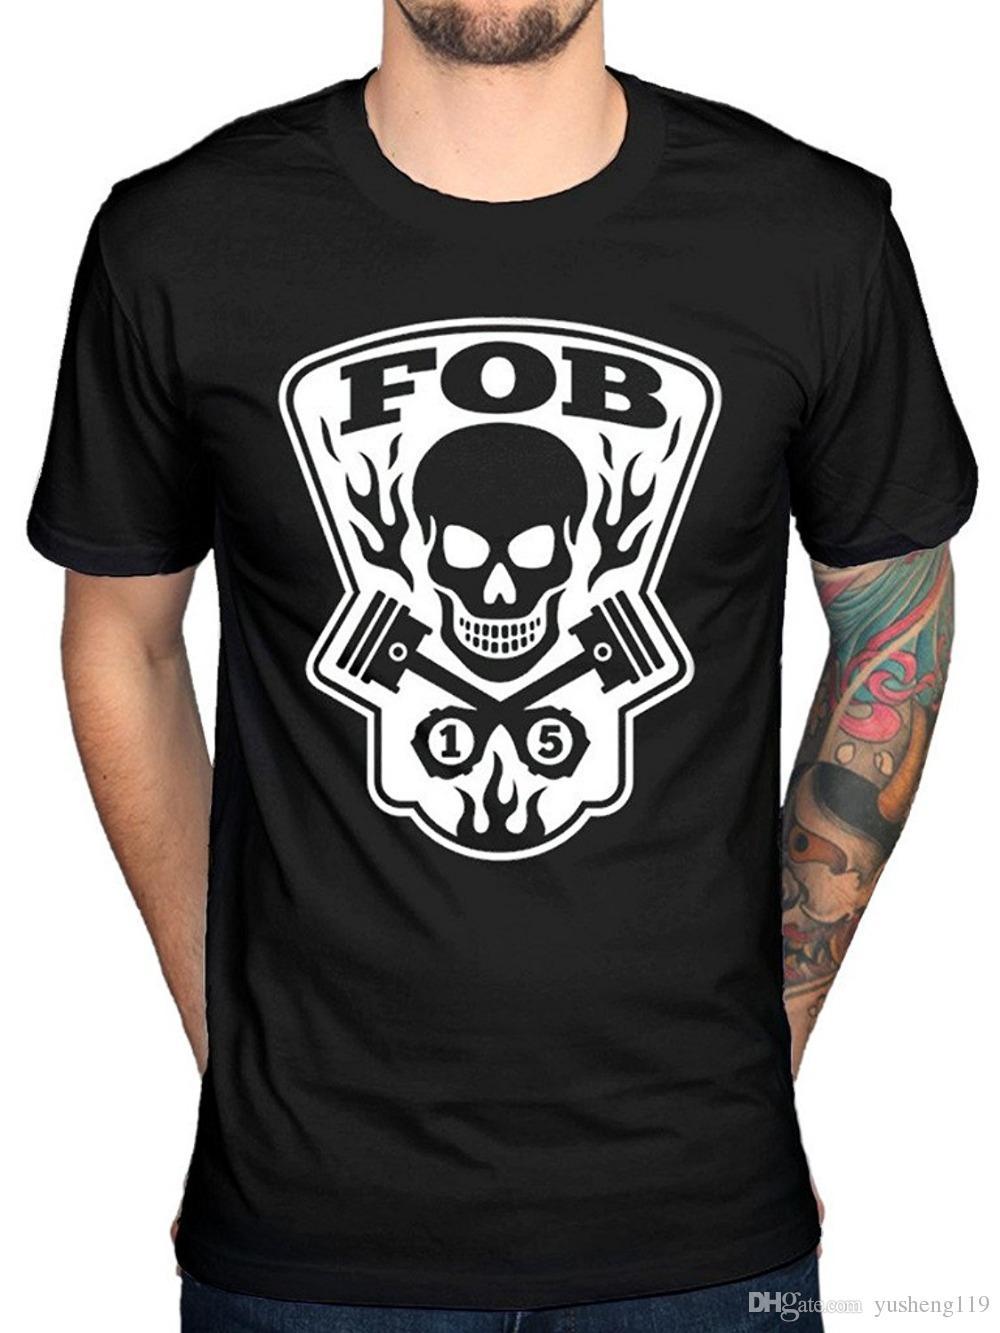 T Shirt Clothing Plus Size Men's Fall Out Boy Gear Head T-Shirt Rock American Beauty Band O-Neck Short Sleeve Christmas Shirt